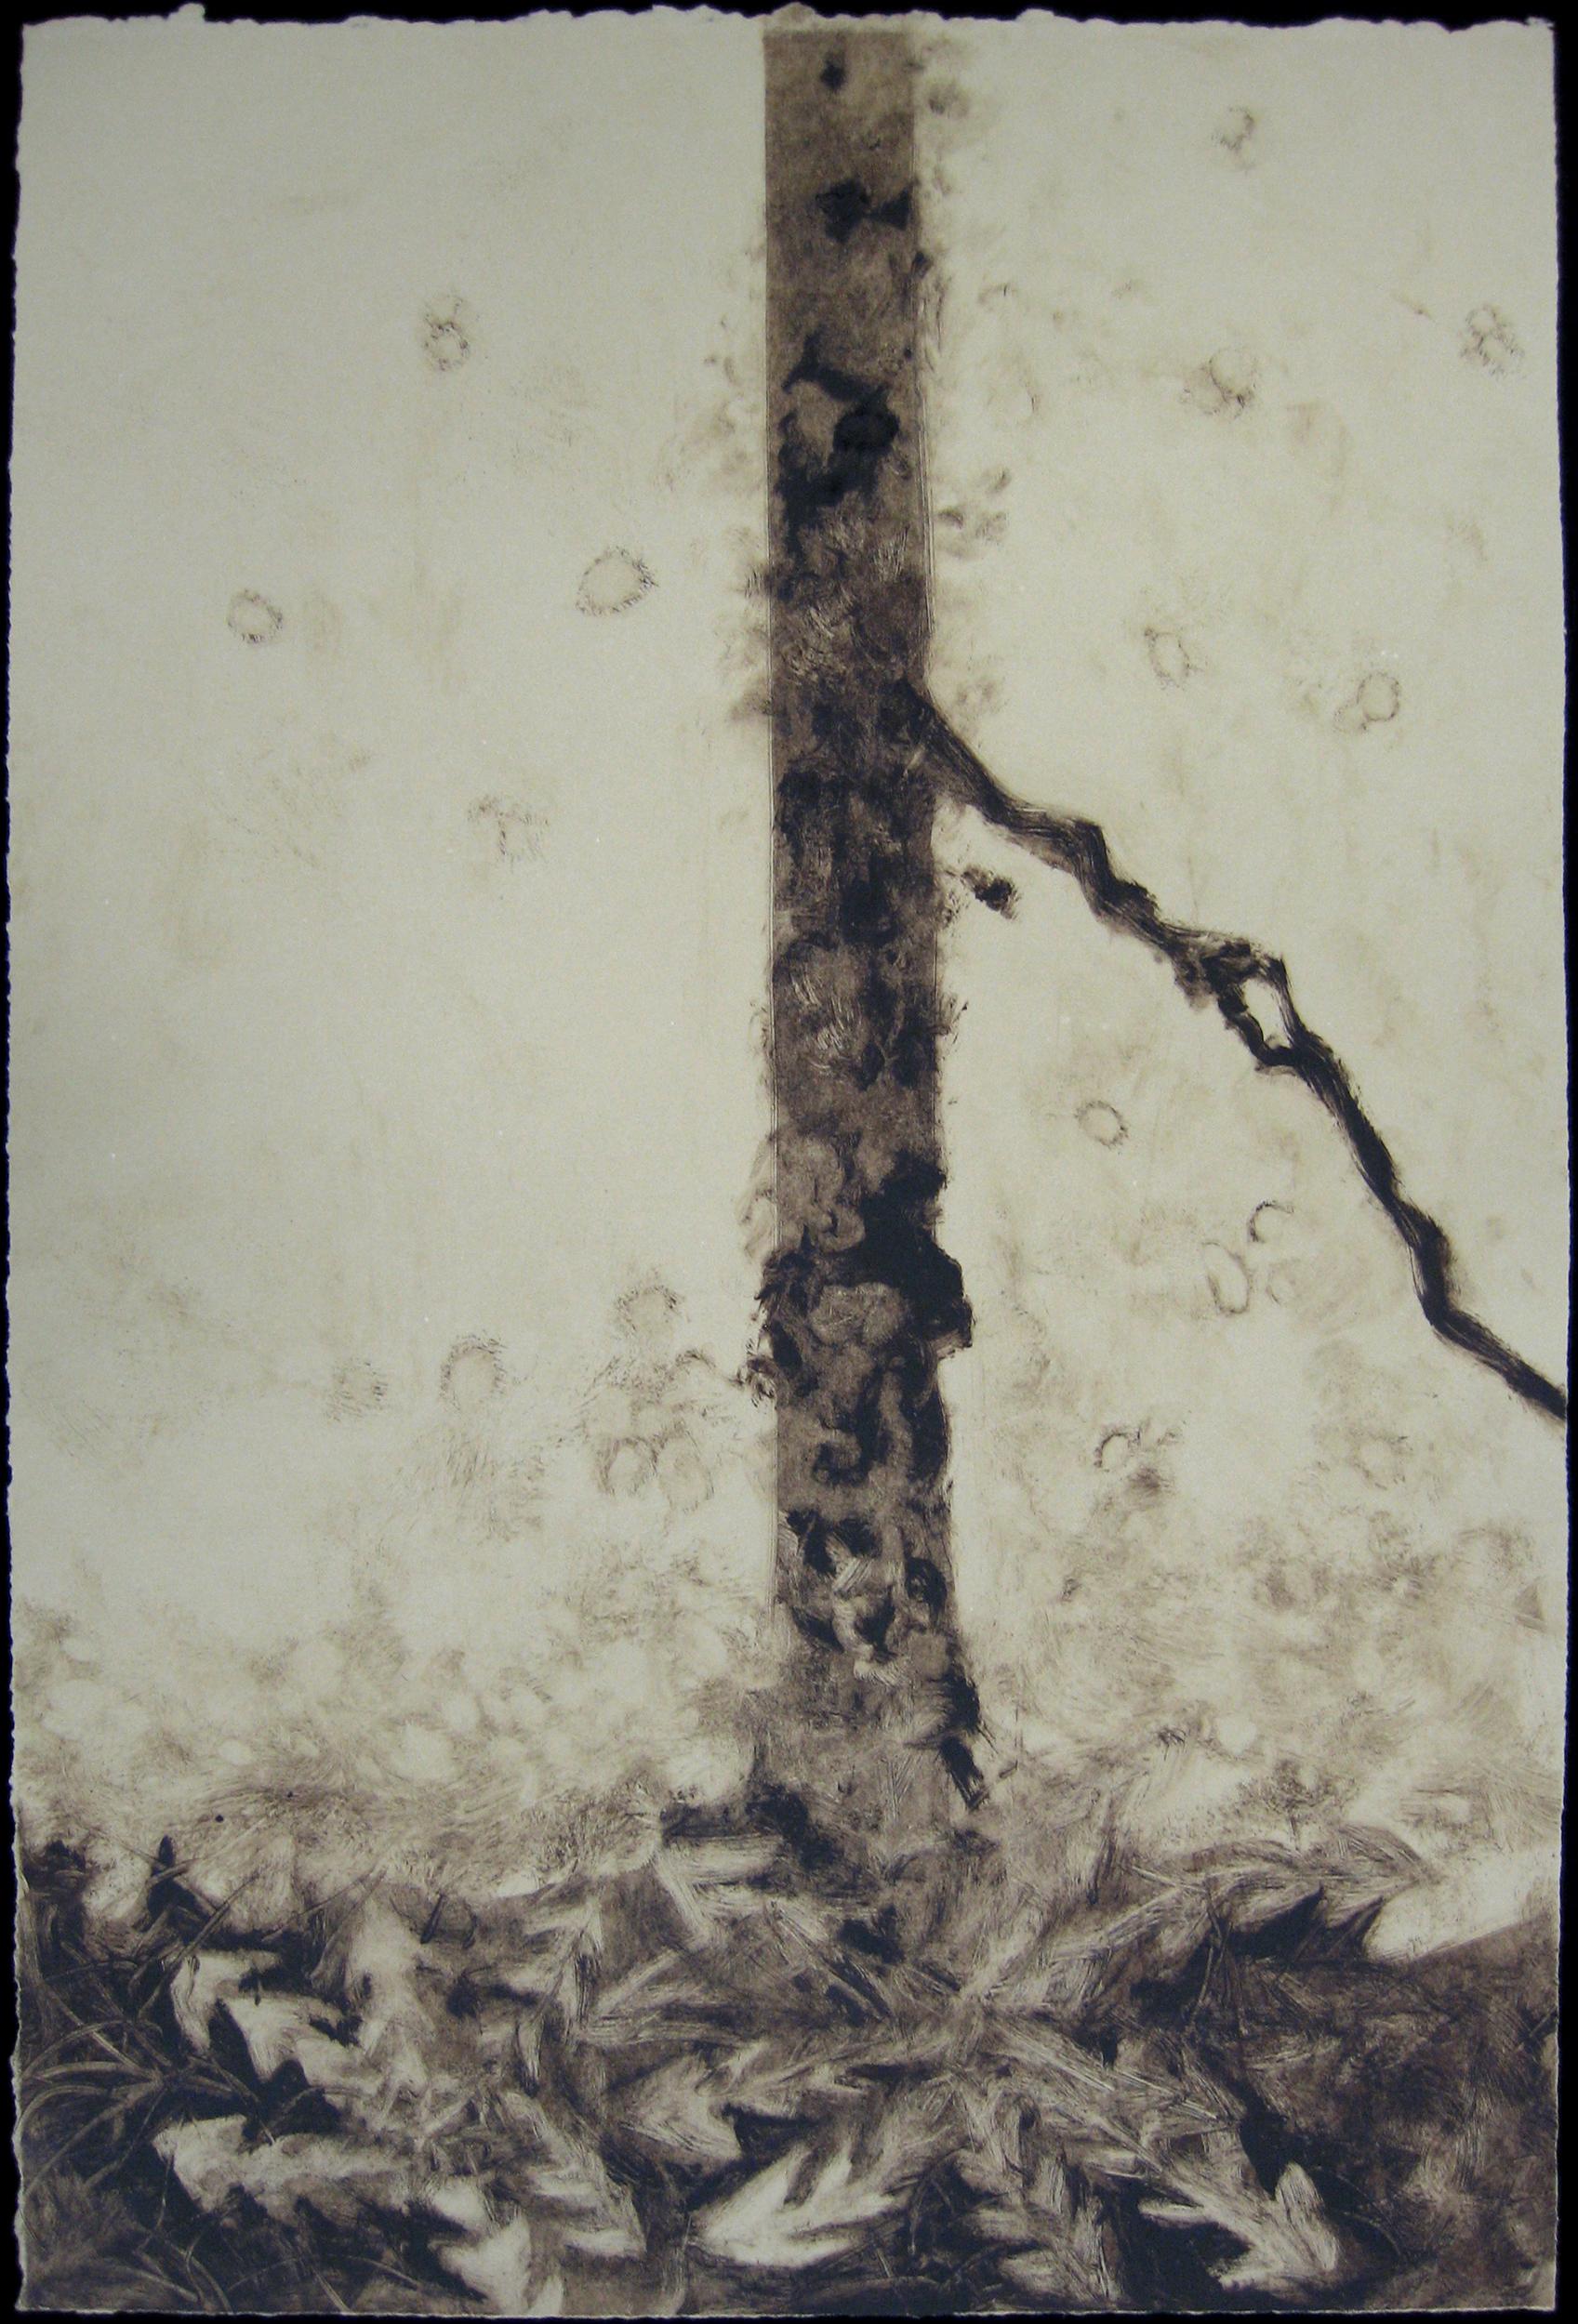 sidewalk-cracks-tan-3-by-emily-hoisington-2009_5346178063_o.jpg